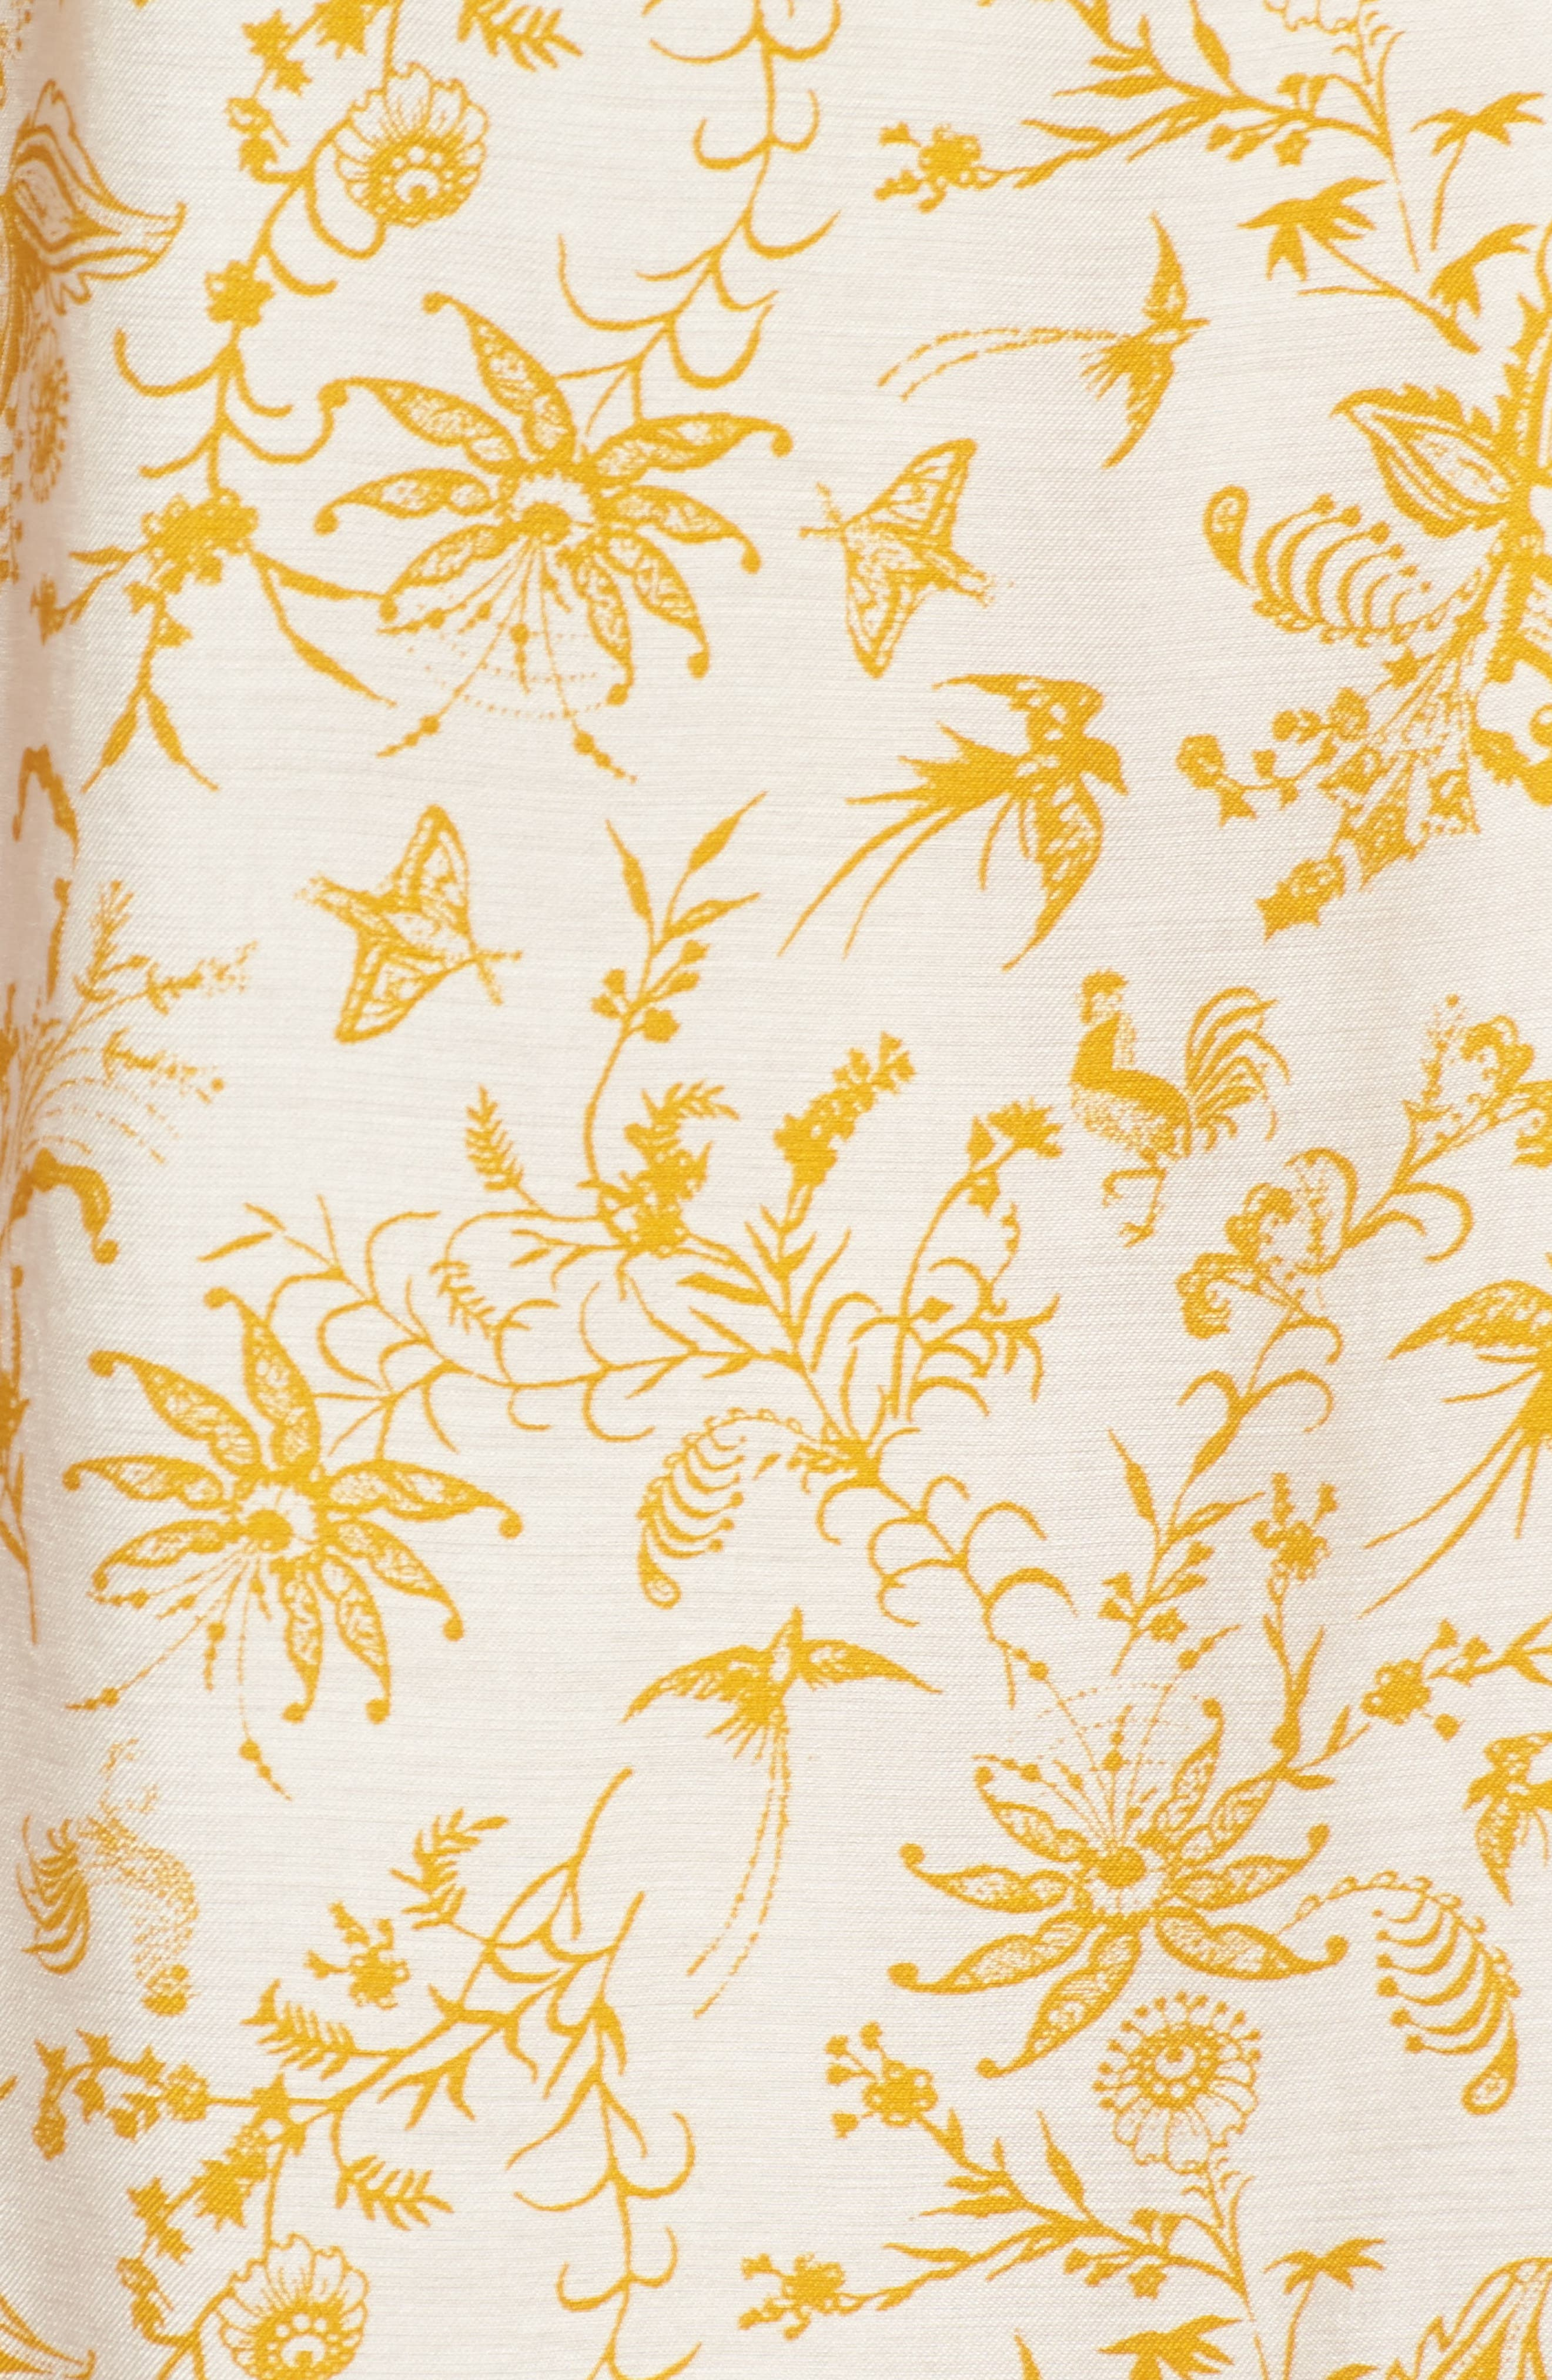 Volume Shoulder Print Top,                             Alternate thumbnail 5, color,                             Ivory Birch Artistic Floral